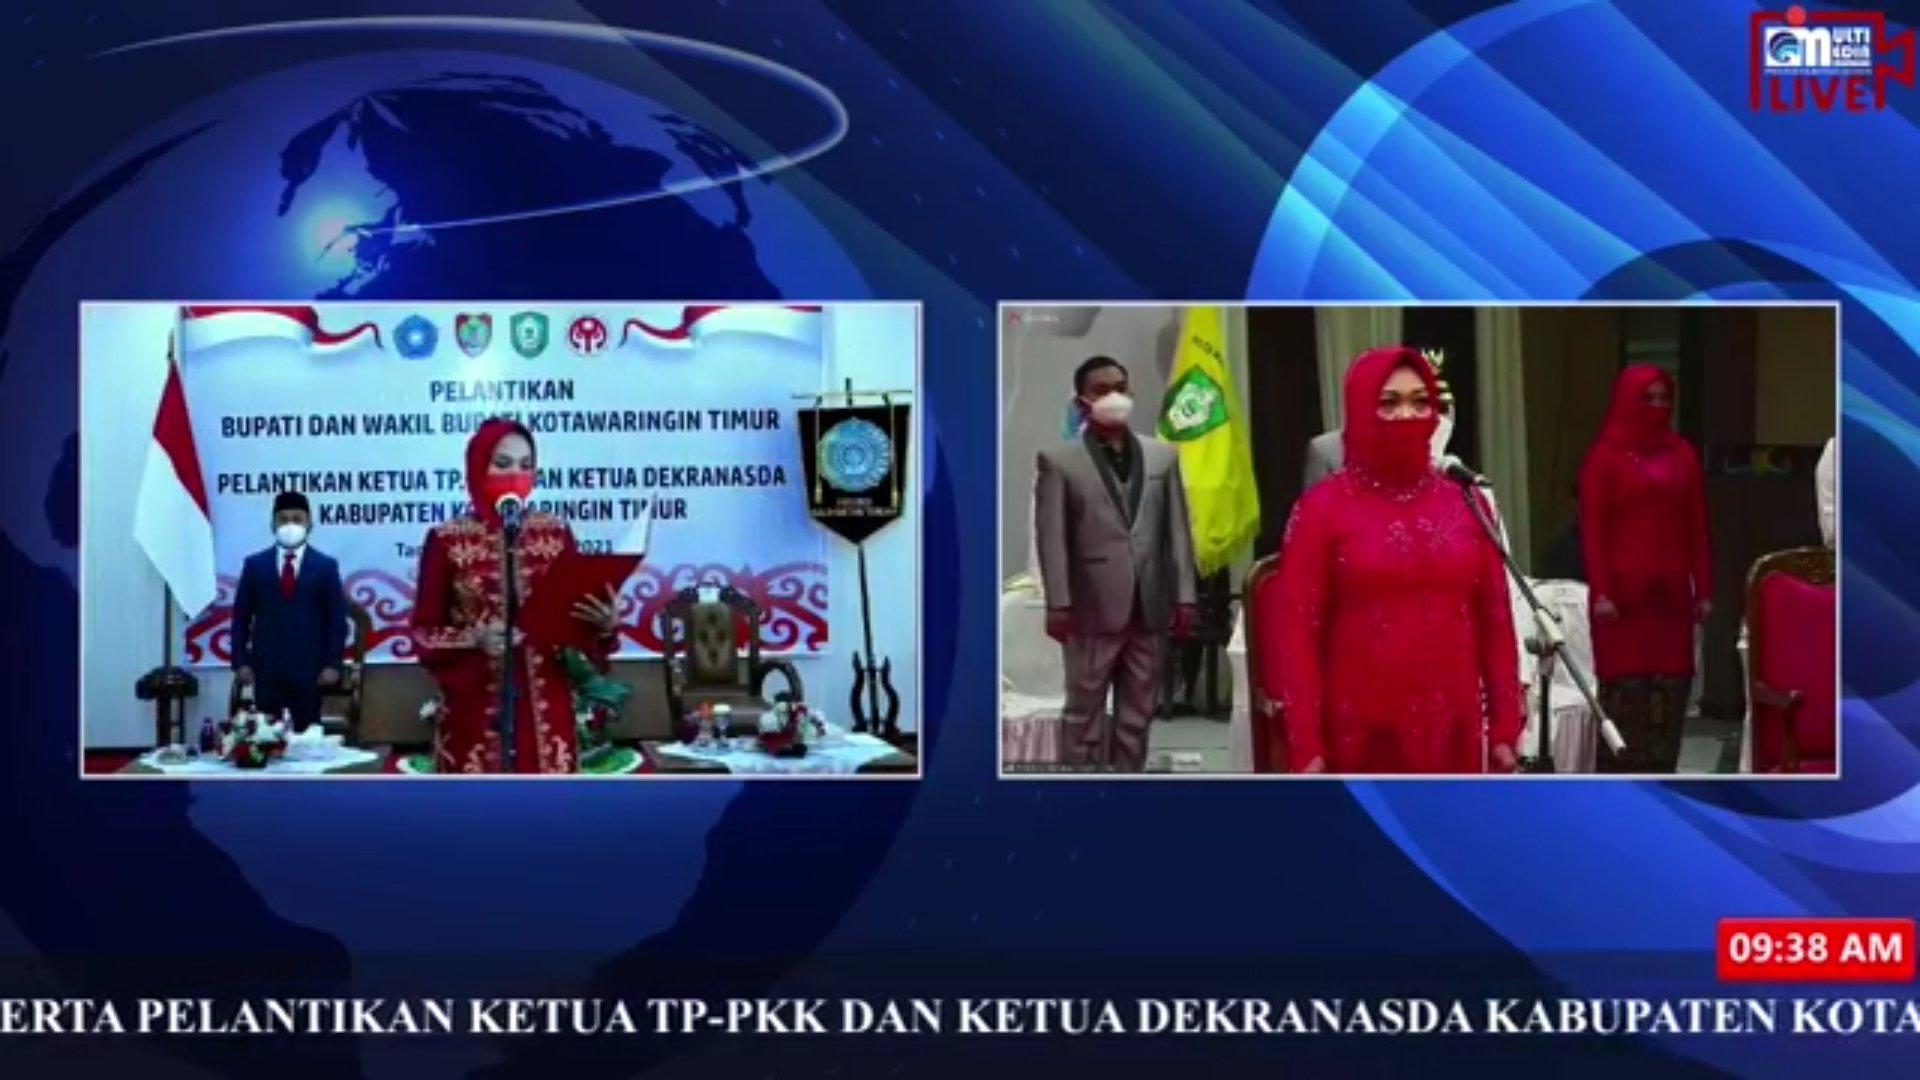 Ivo Sugianto Sabran Lantik Ketua TP PKK dan Dekranasda Kabupaten Kotawaringin Timur